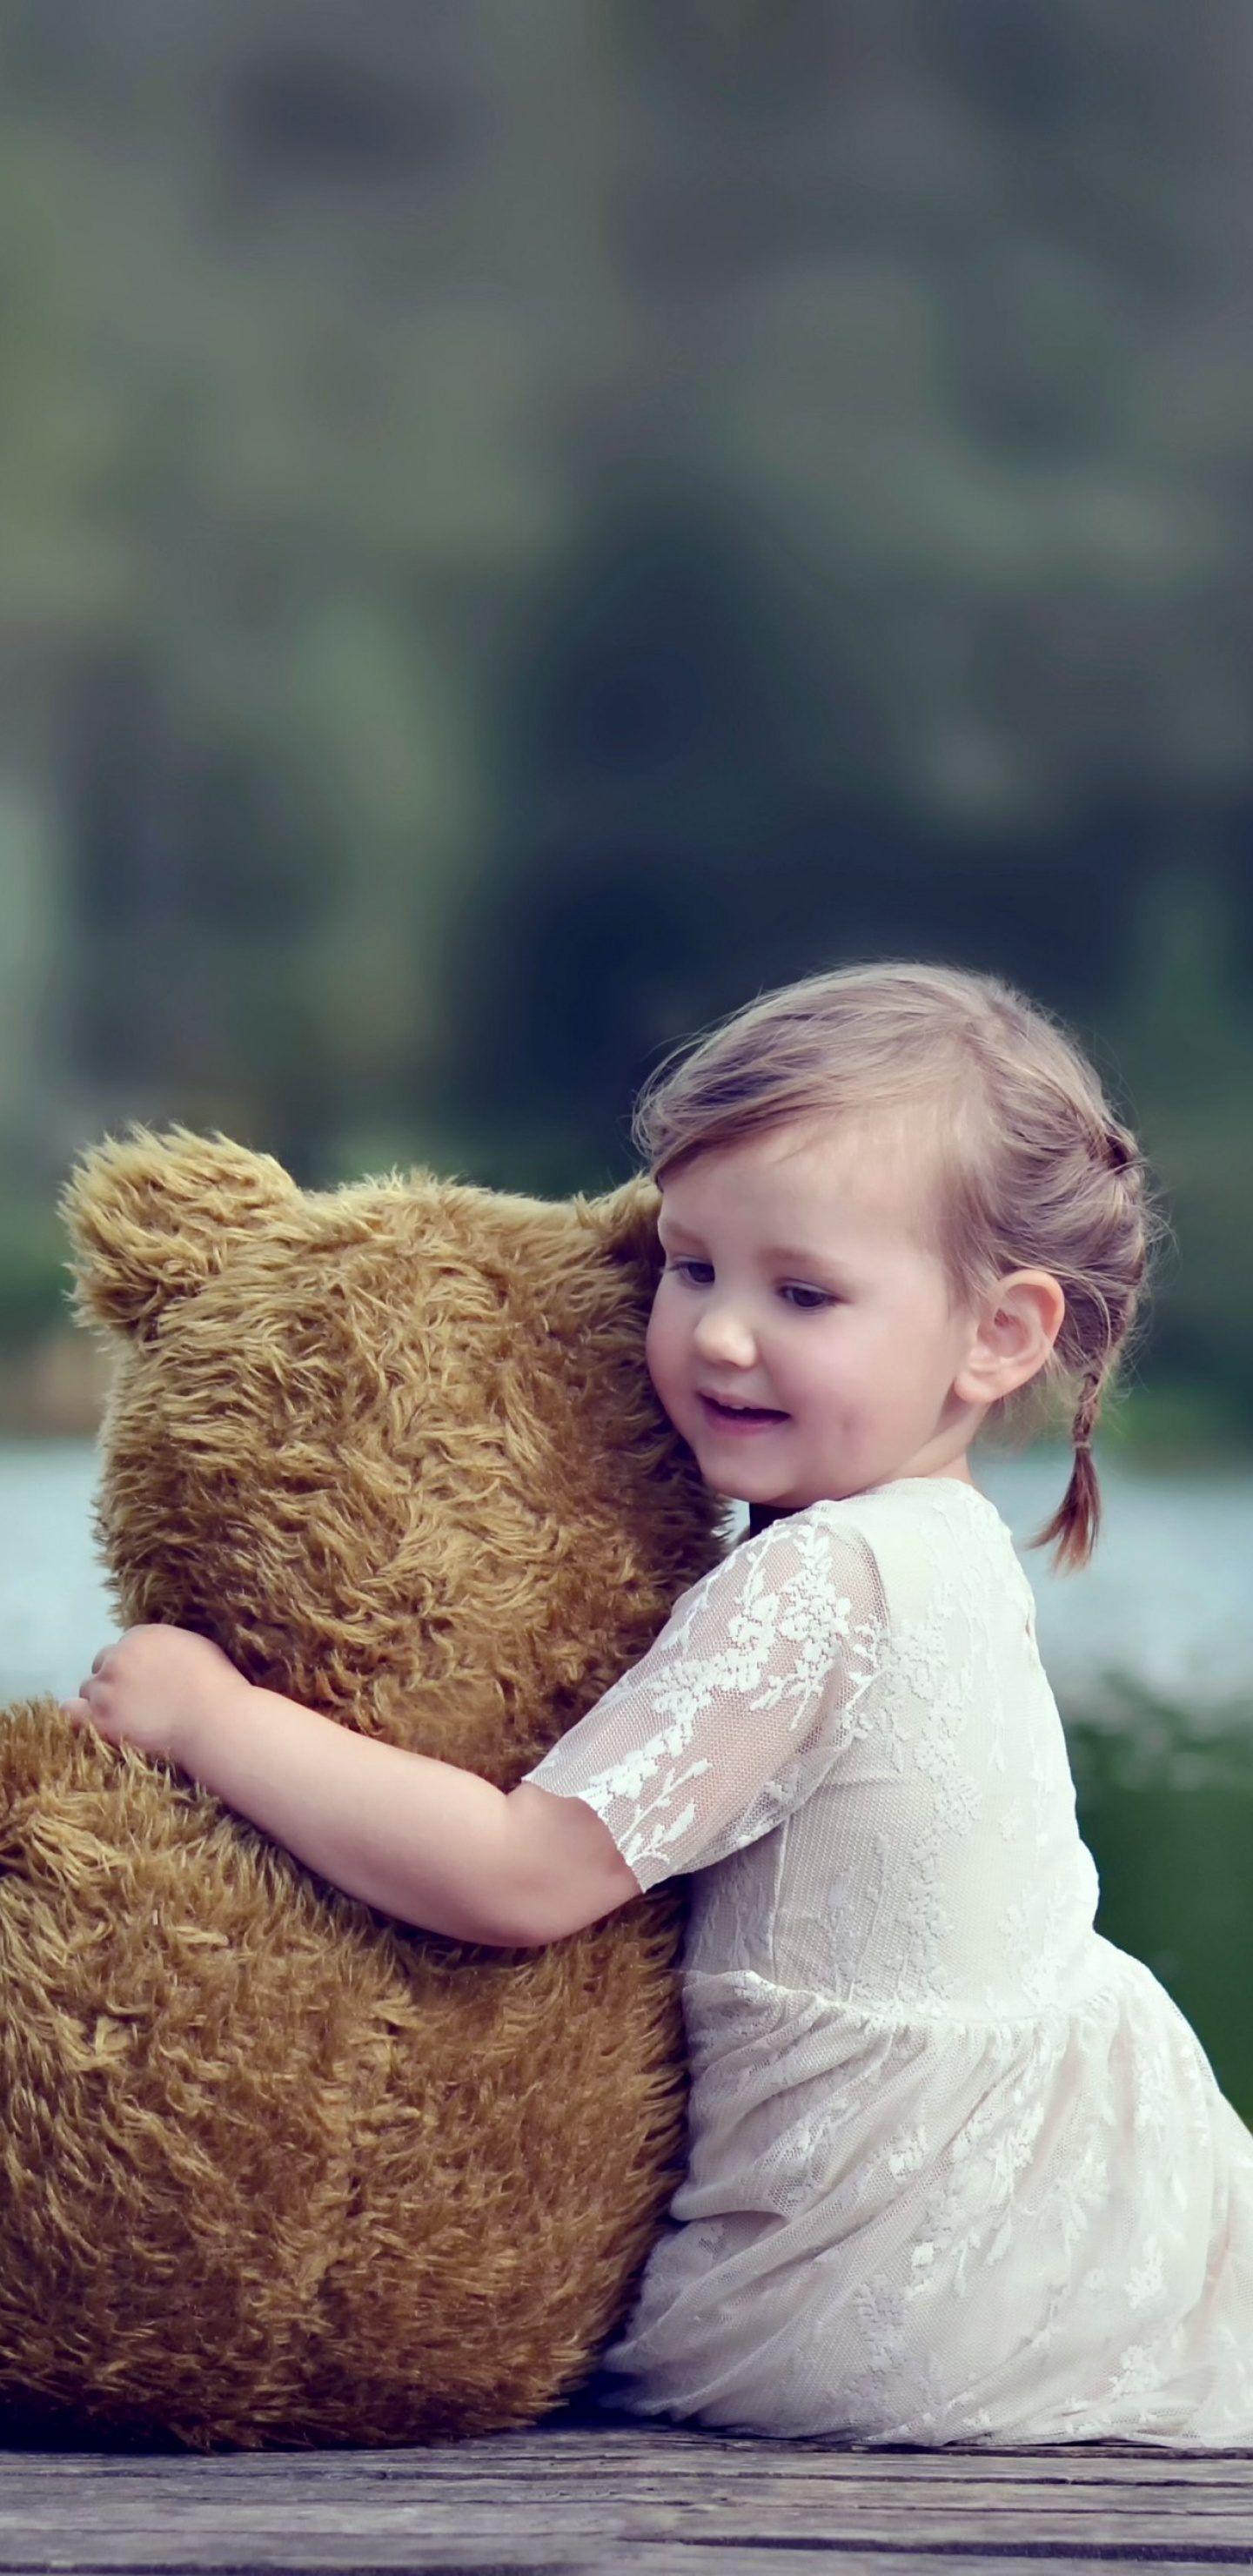 خلفيات ايفون بنات Hd Tecnologis Teddy Bear Girl Child Life Mom Life Hacks